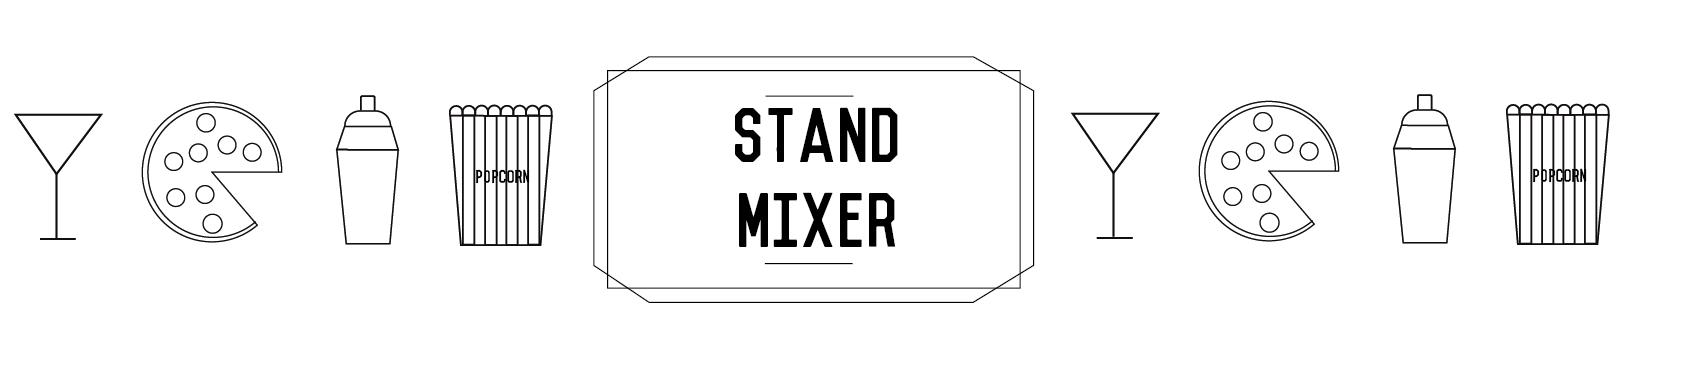 Standmixer